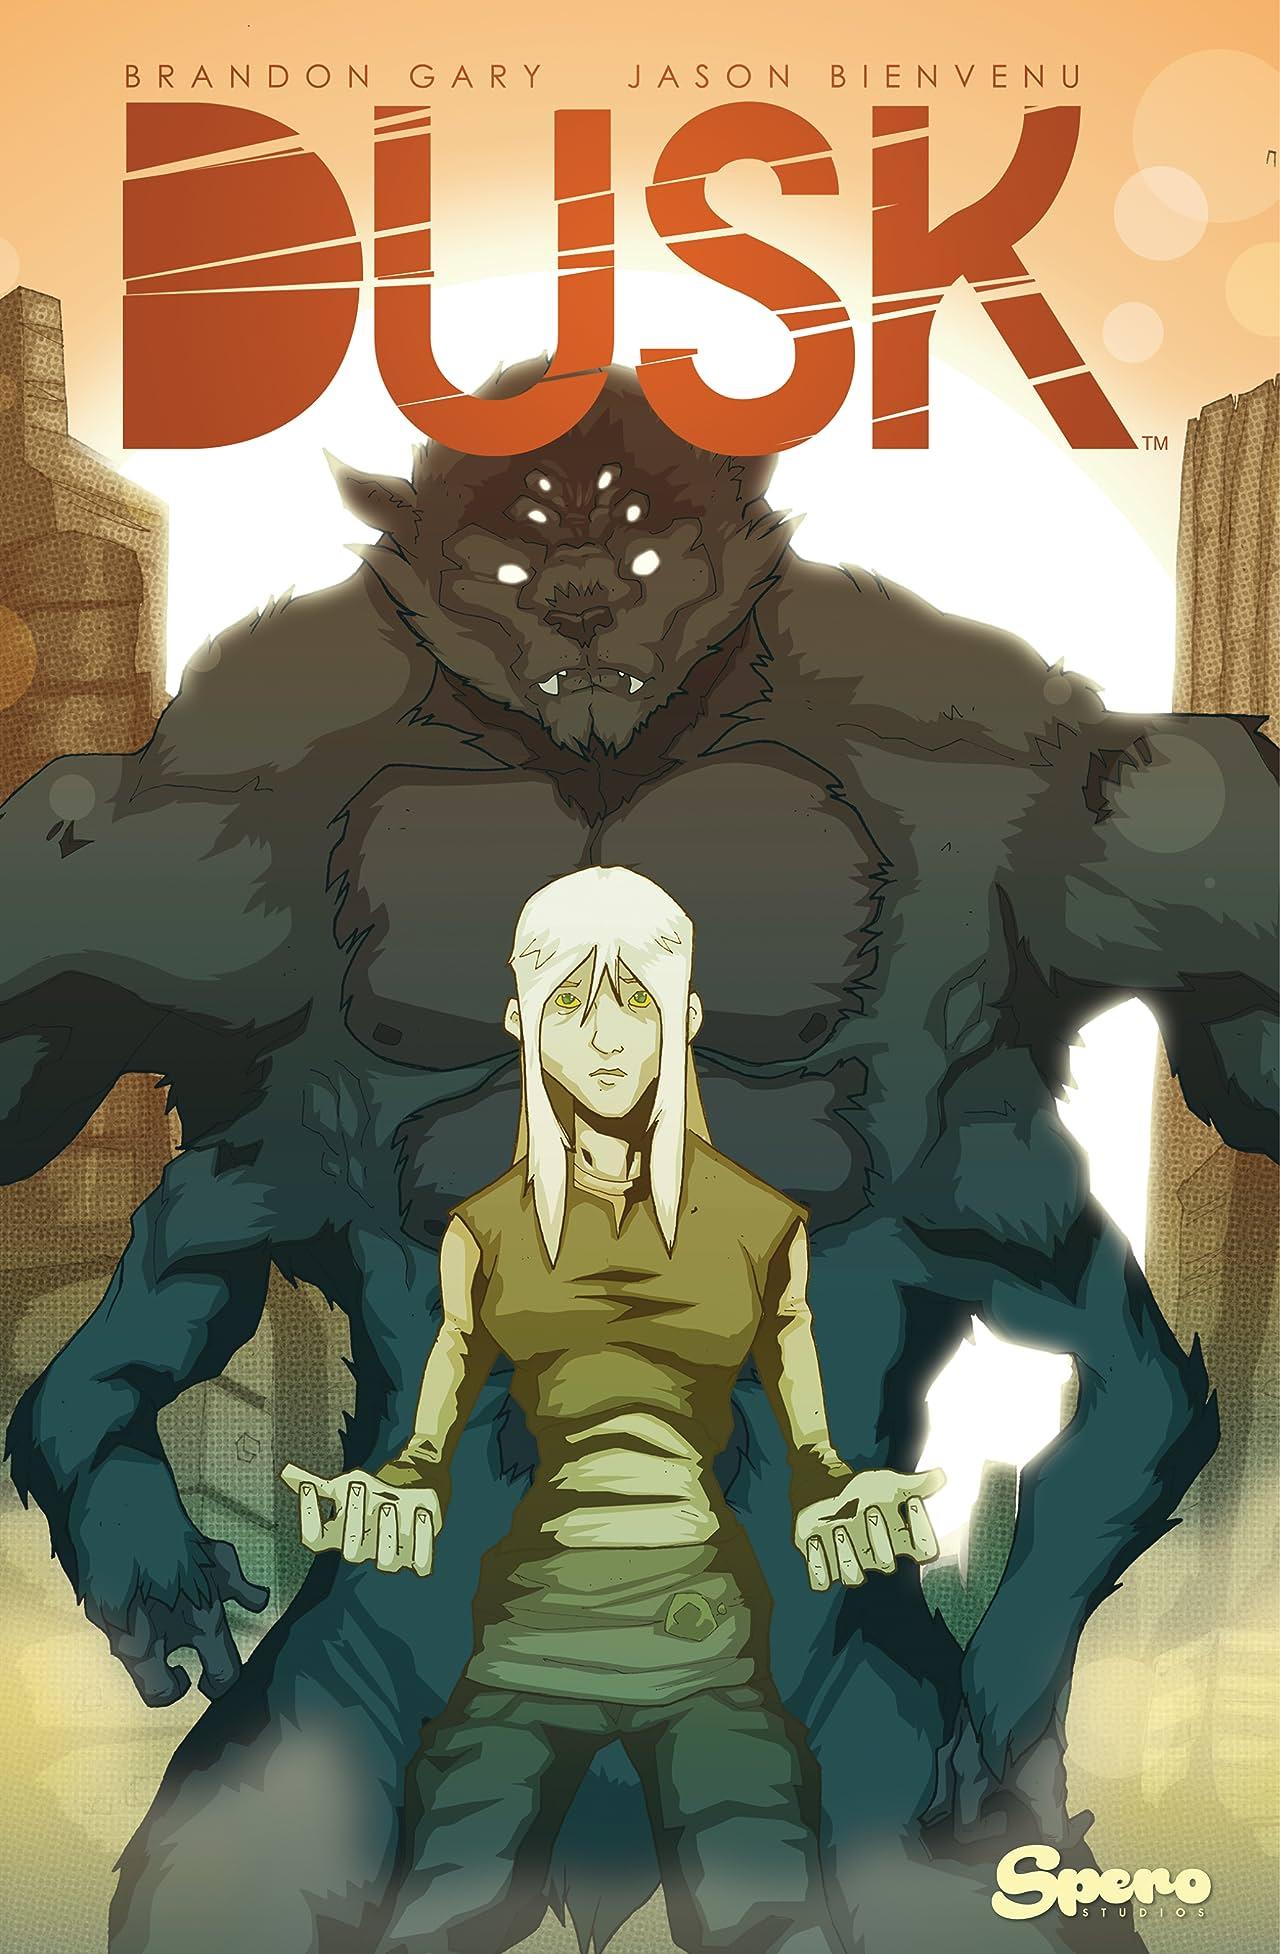 Dusk Vol. 1